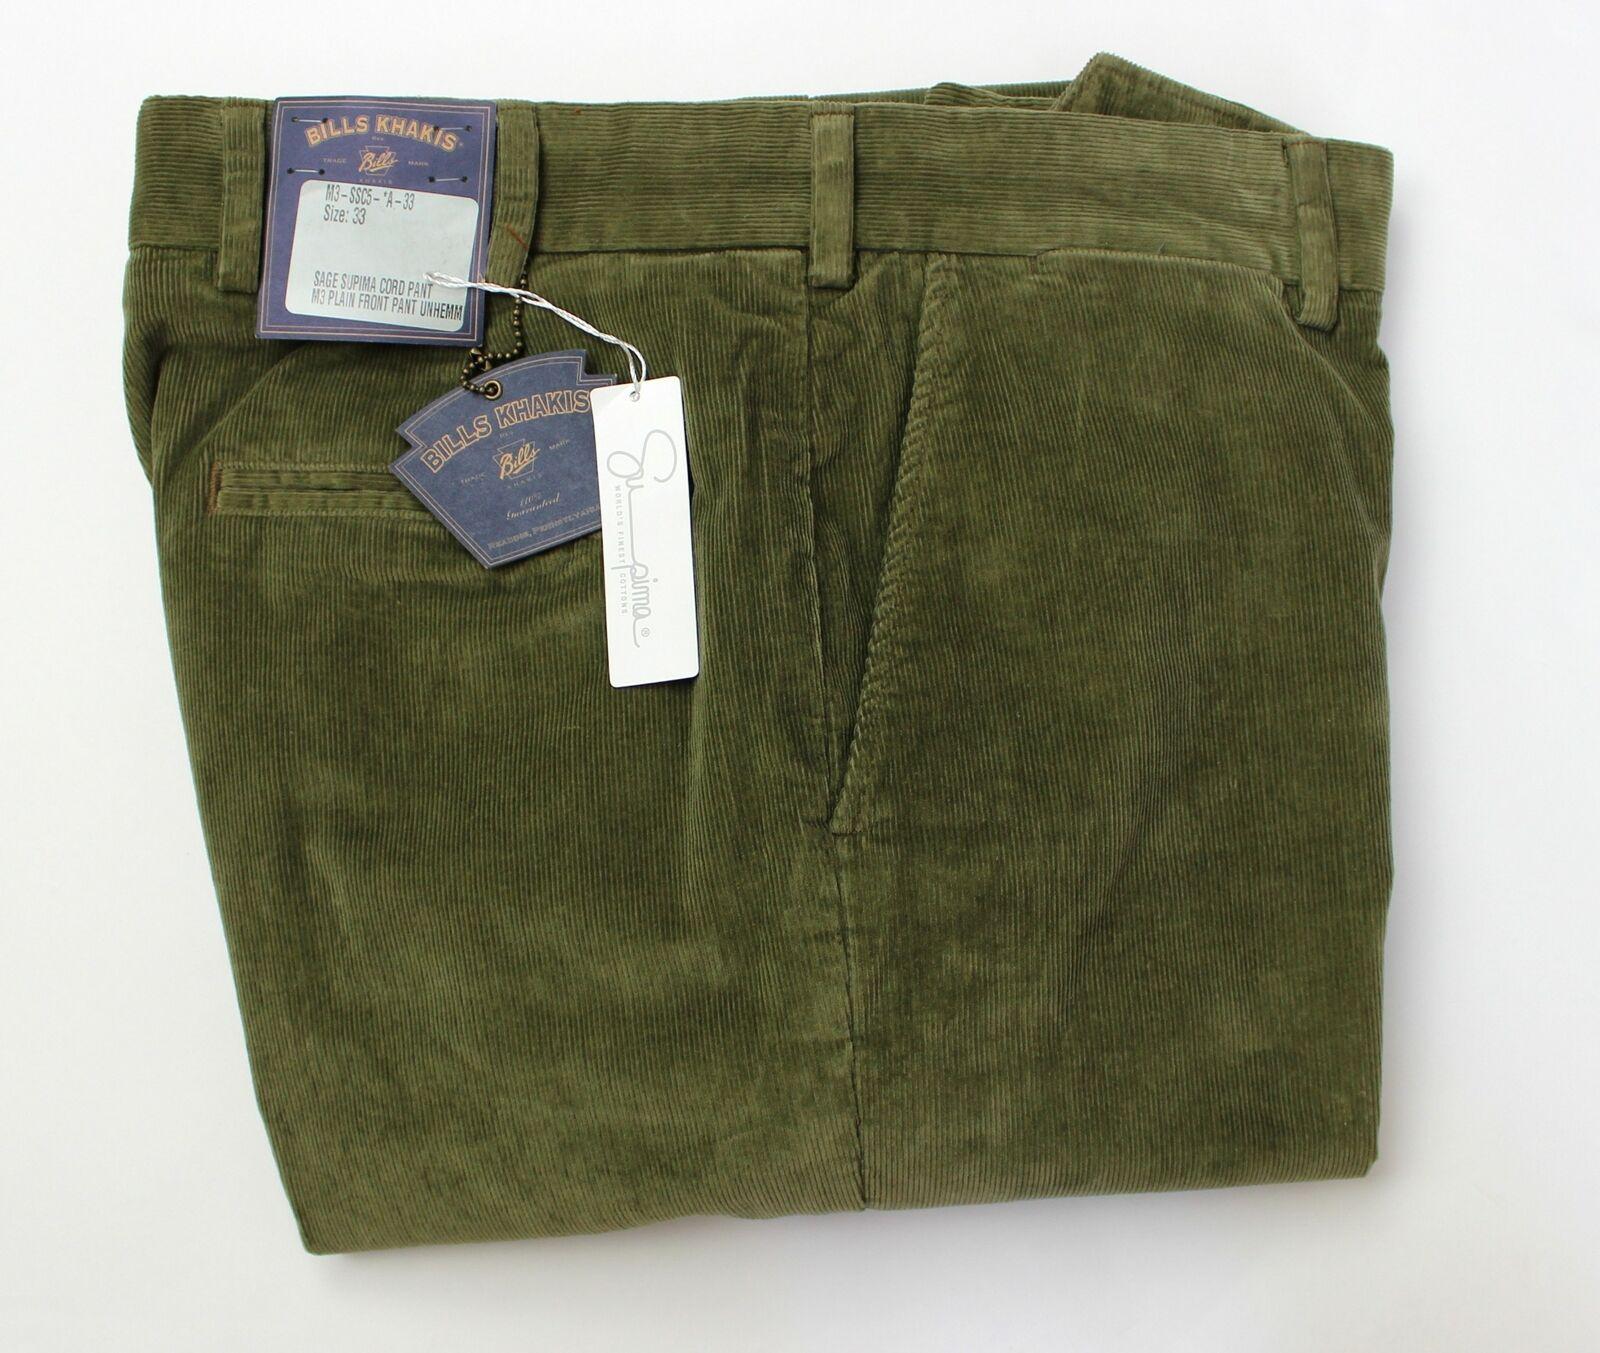 BRAND NEW-Bills Khakis M3 Sage Green 15 Wale Corduroy Pants-33-MSRP